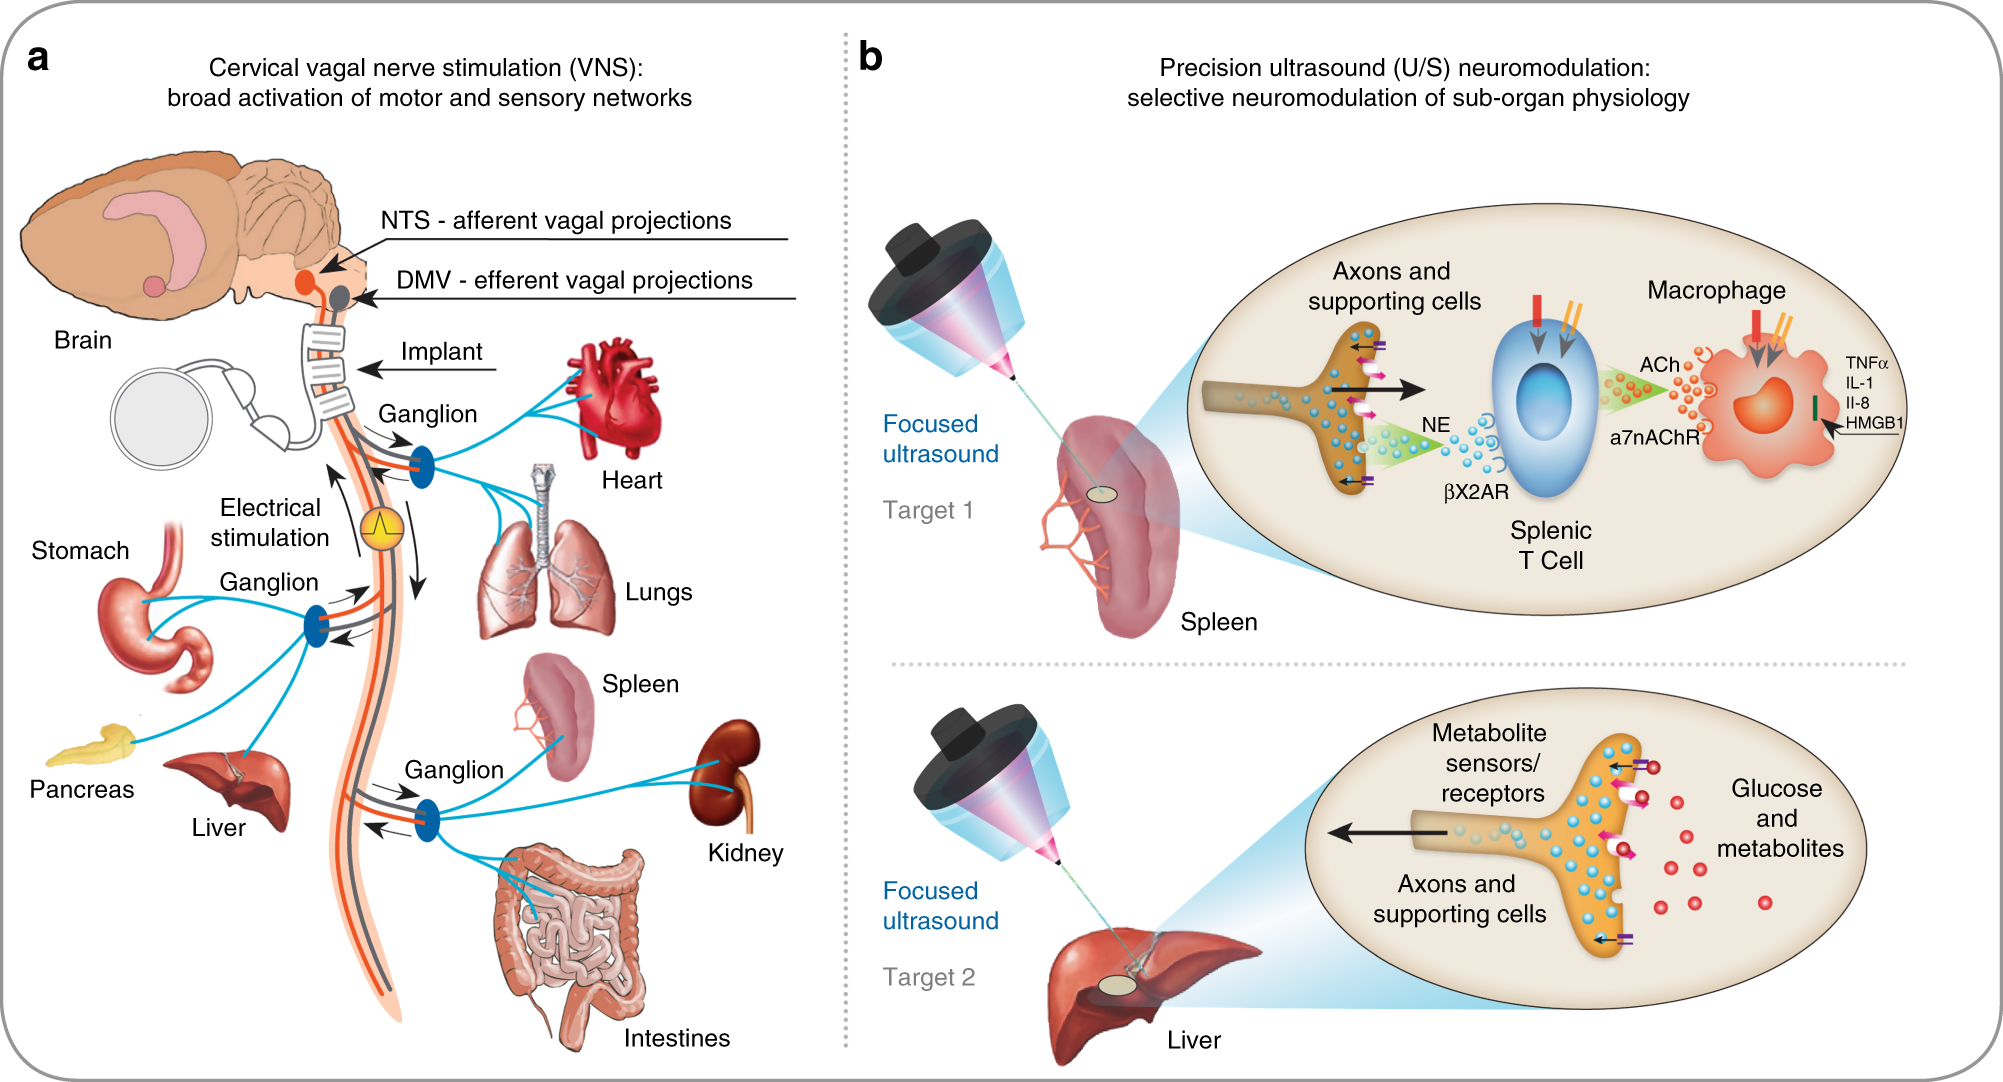 noninvasive sub-organ ultrasound stimulation for targeted neuromodulation |  nature communications